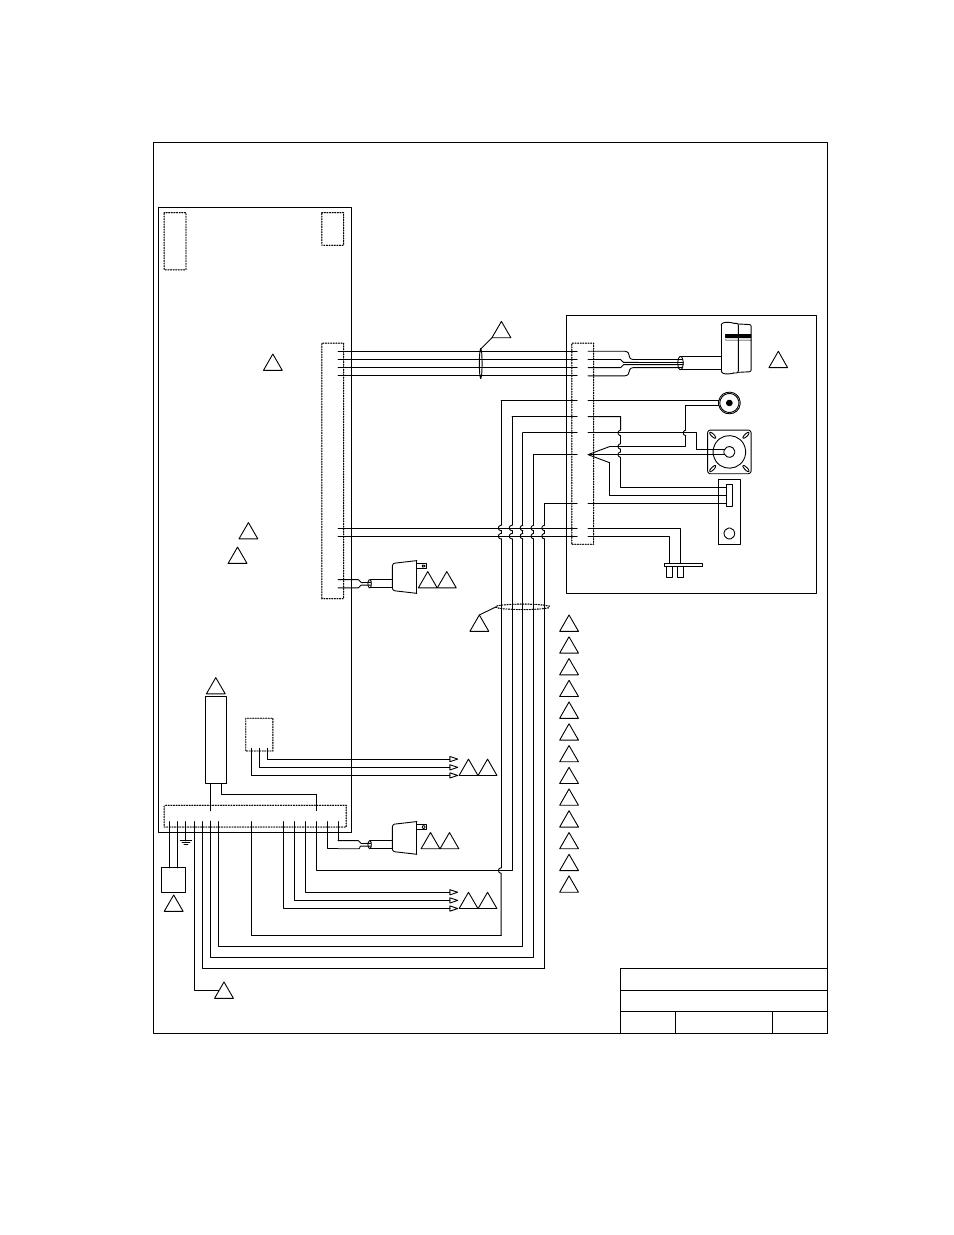 hight resolution of door king 1838 wiring diagrams 30 wiring diagram images western plow solenoid wiring diagram western plow joystick wiring diagram